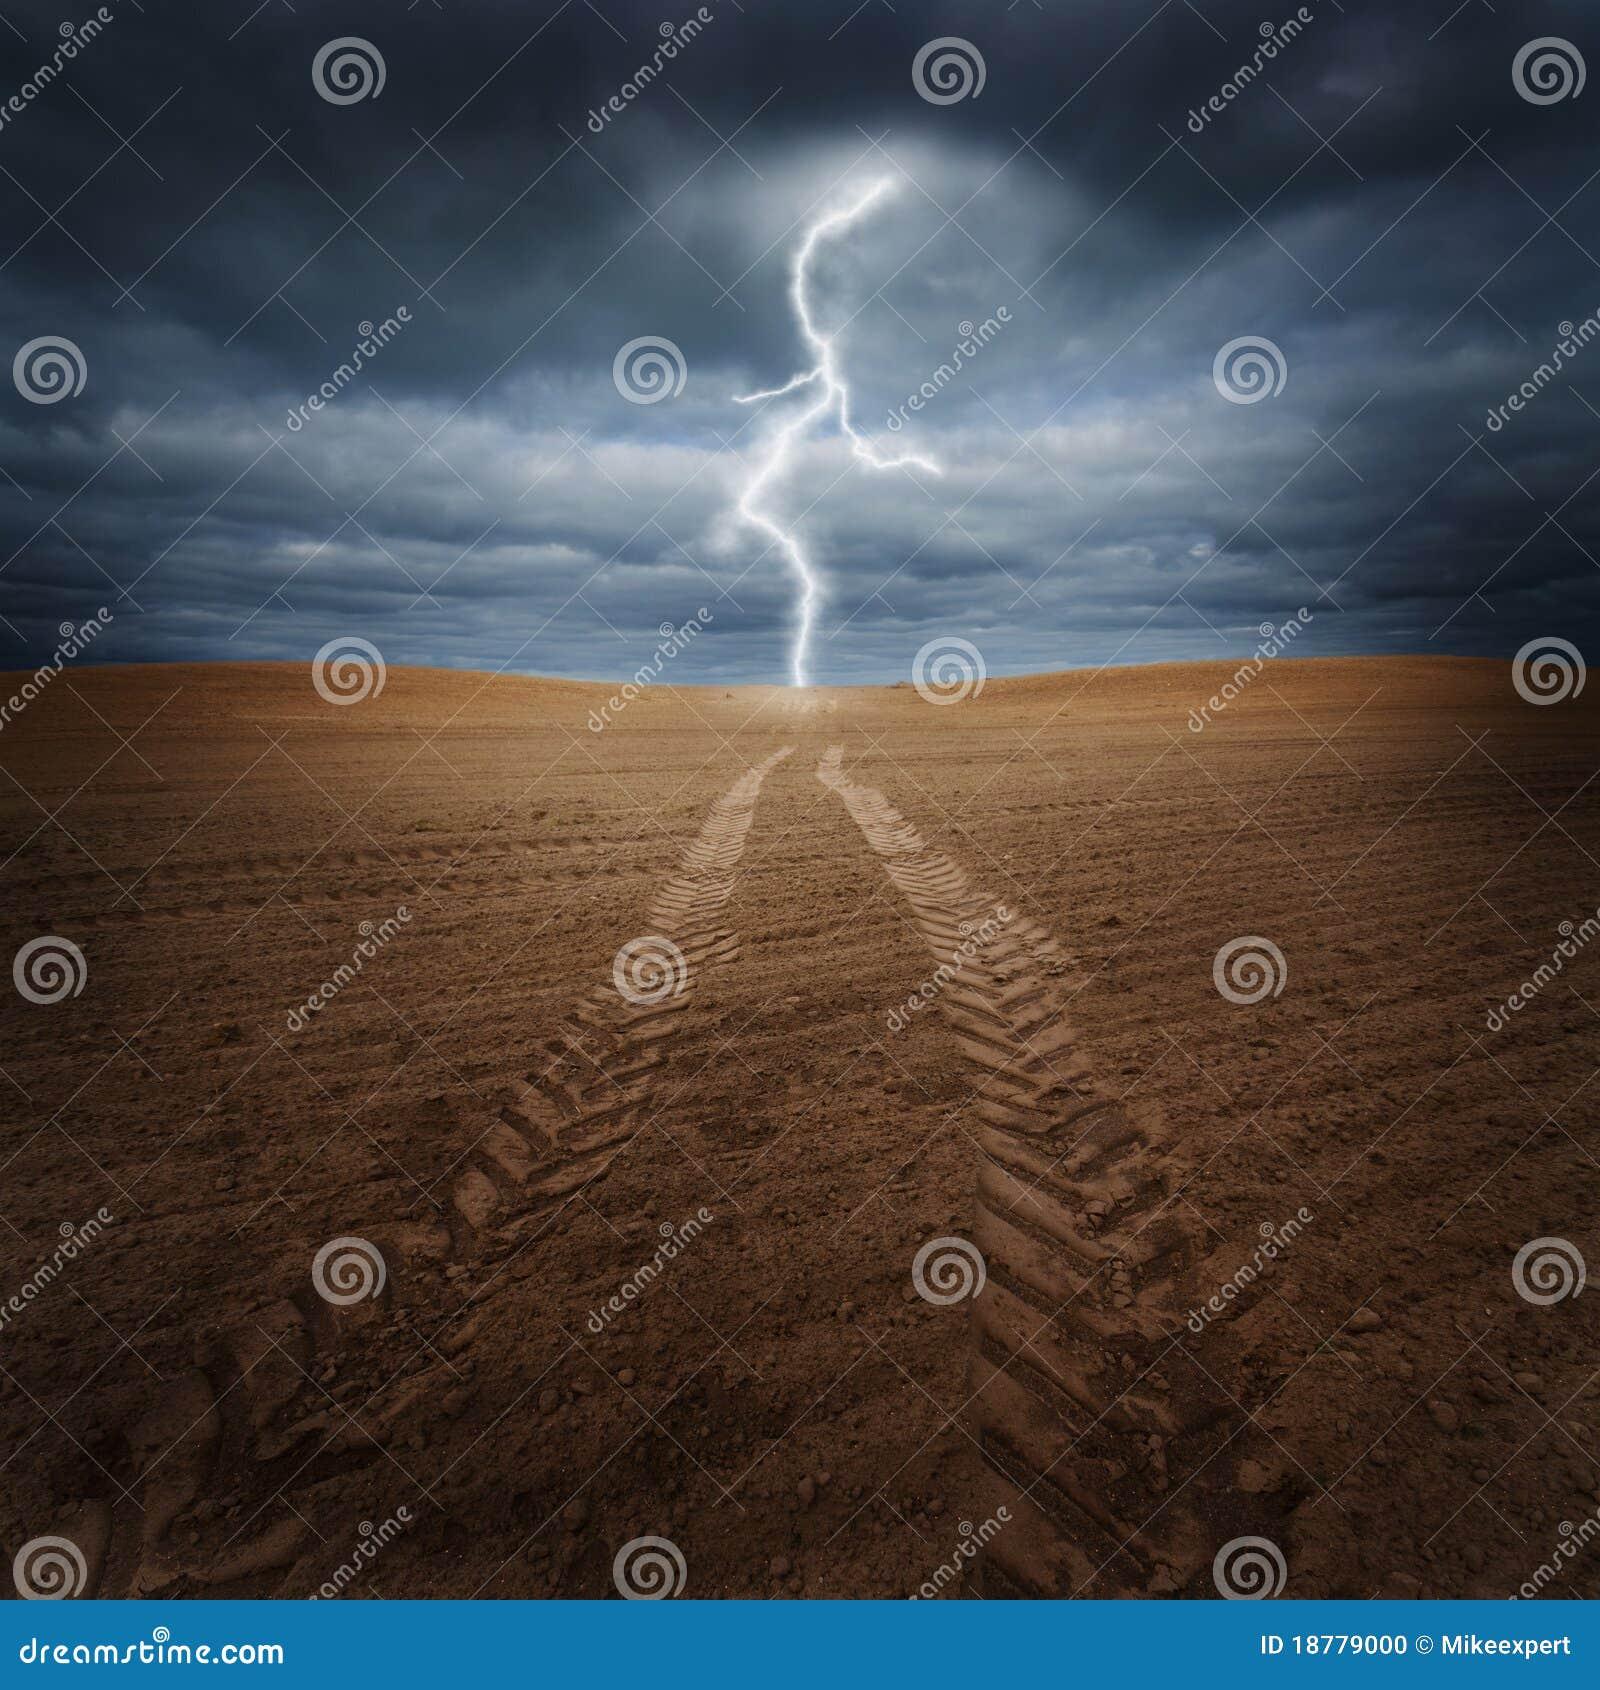 Sturm auf dem Feld